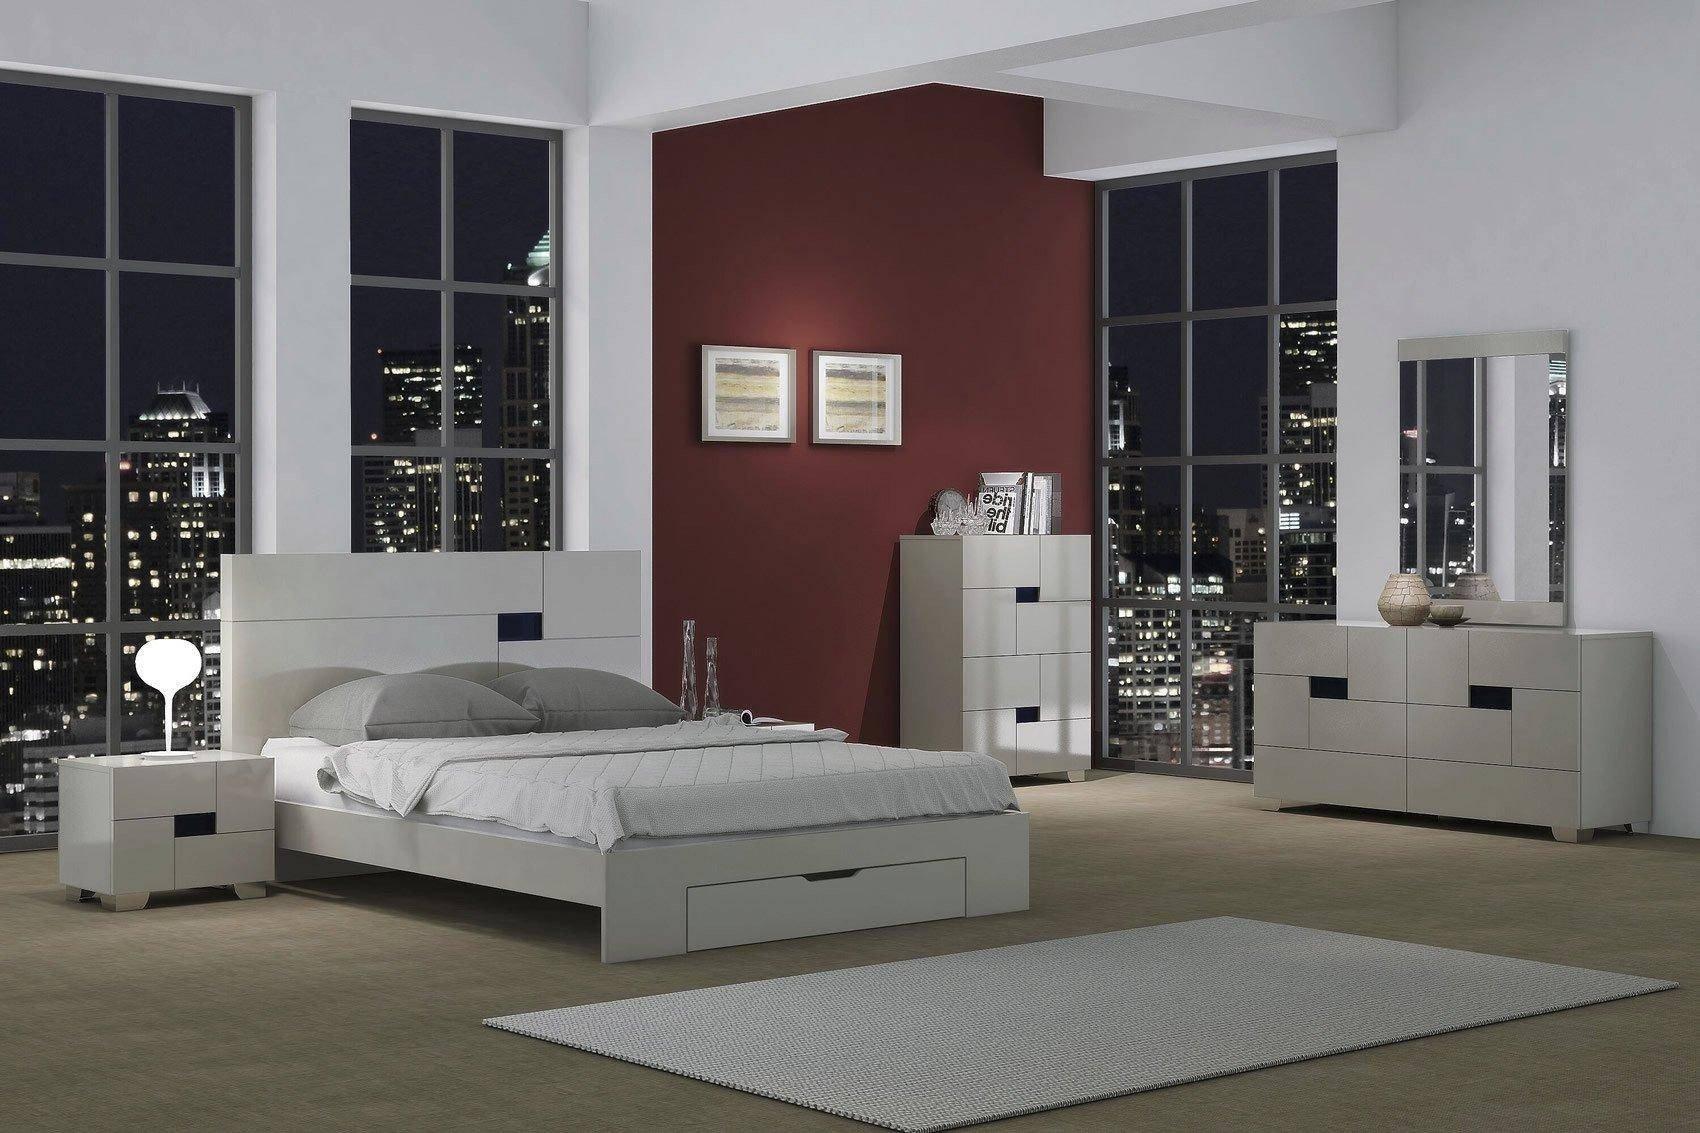 5 Piece Bedroom Set Best Of Contemporary Light Gray Lacquer Storage Queen Bedroom Set